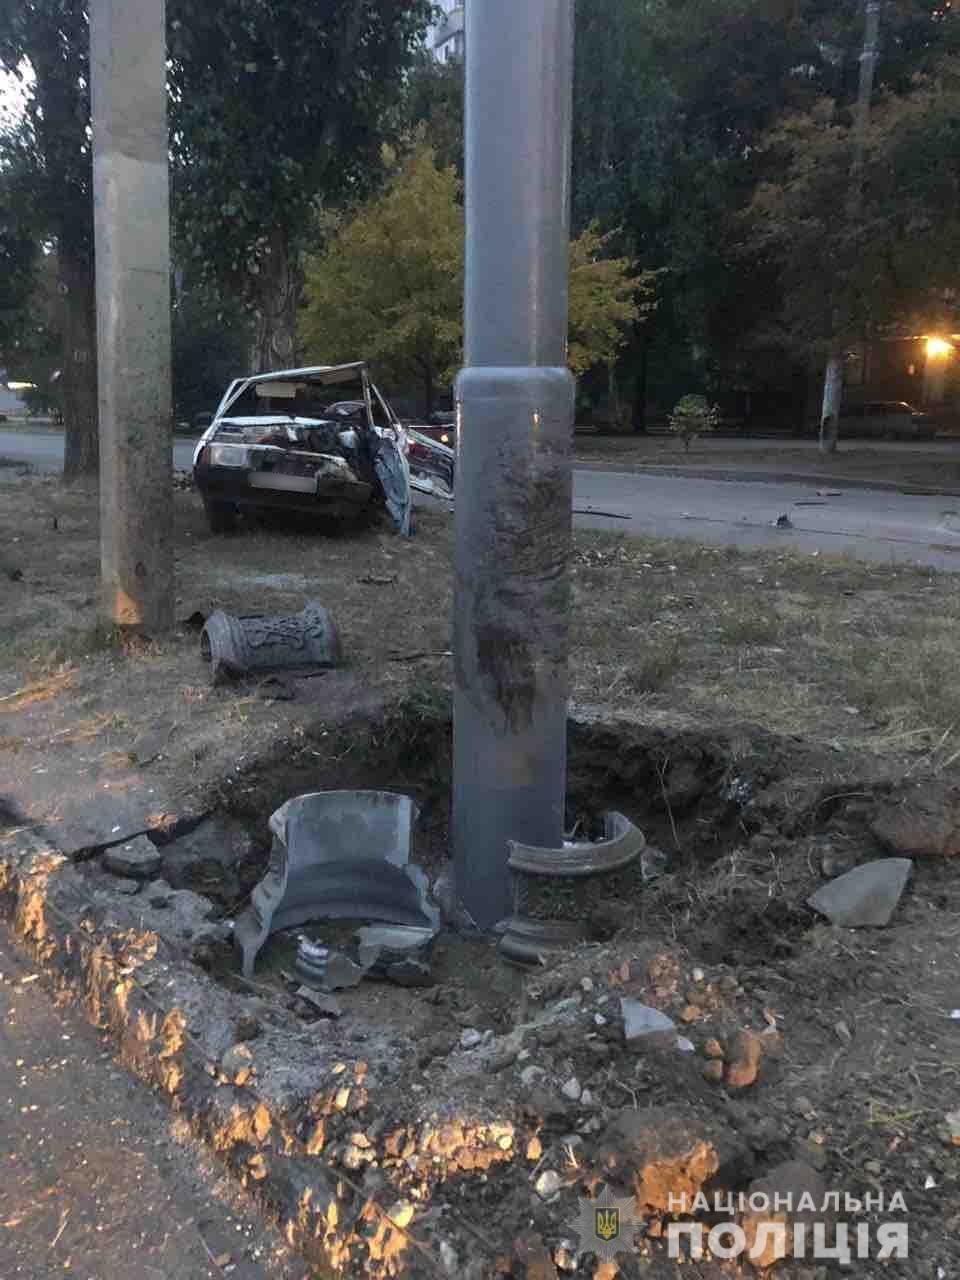 В Харькове пьяный водитель на «ВАЗ» врезался в столб и дерево. Мужчина погиб, - ФОТО, фото-1